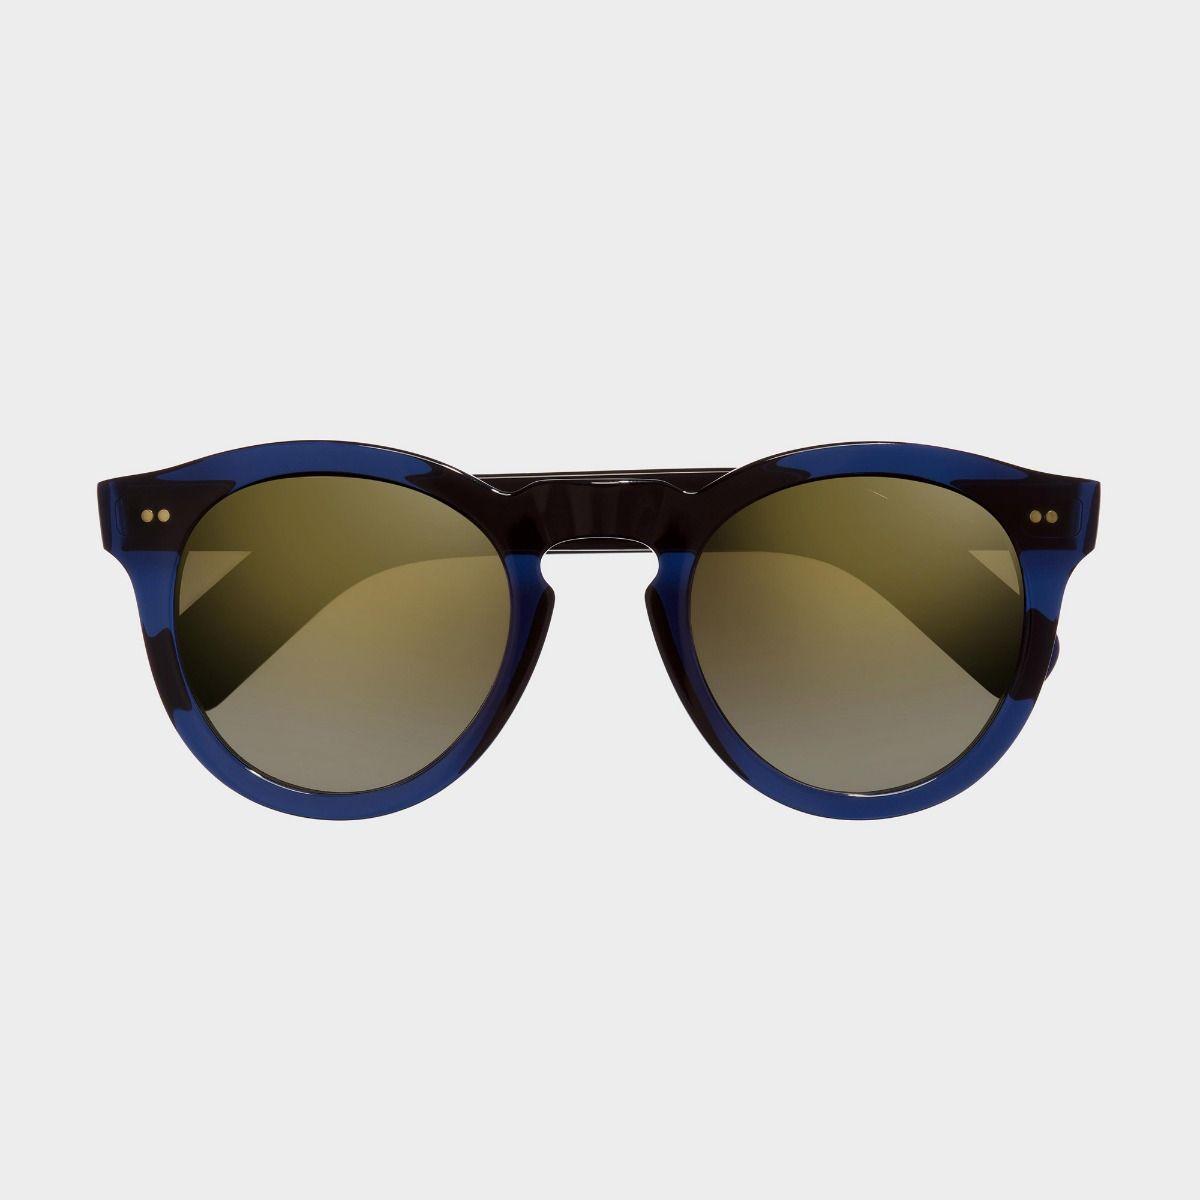 0734V2 Round Sunglasses (Small)-Classic Navy Blue